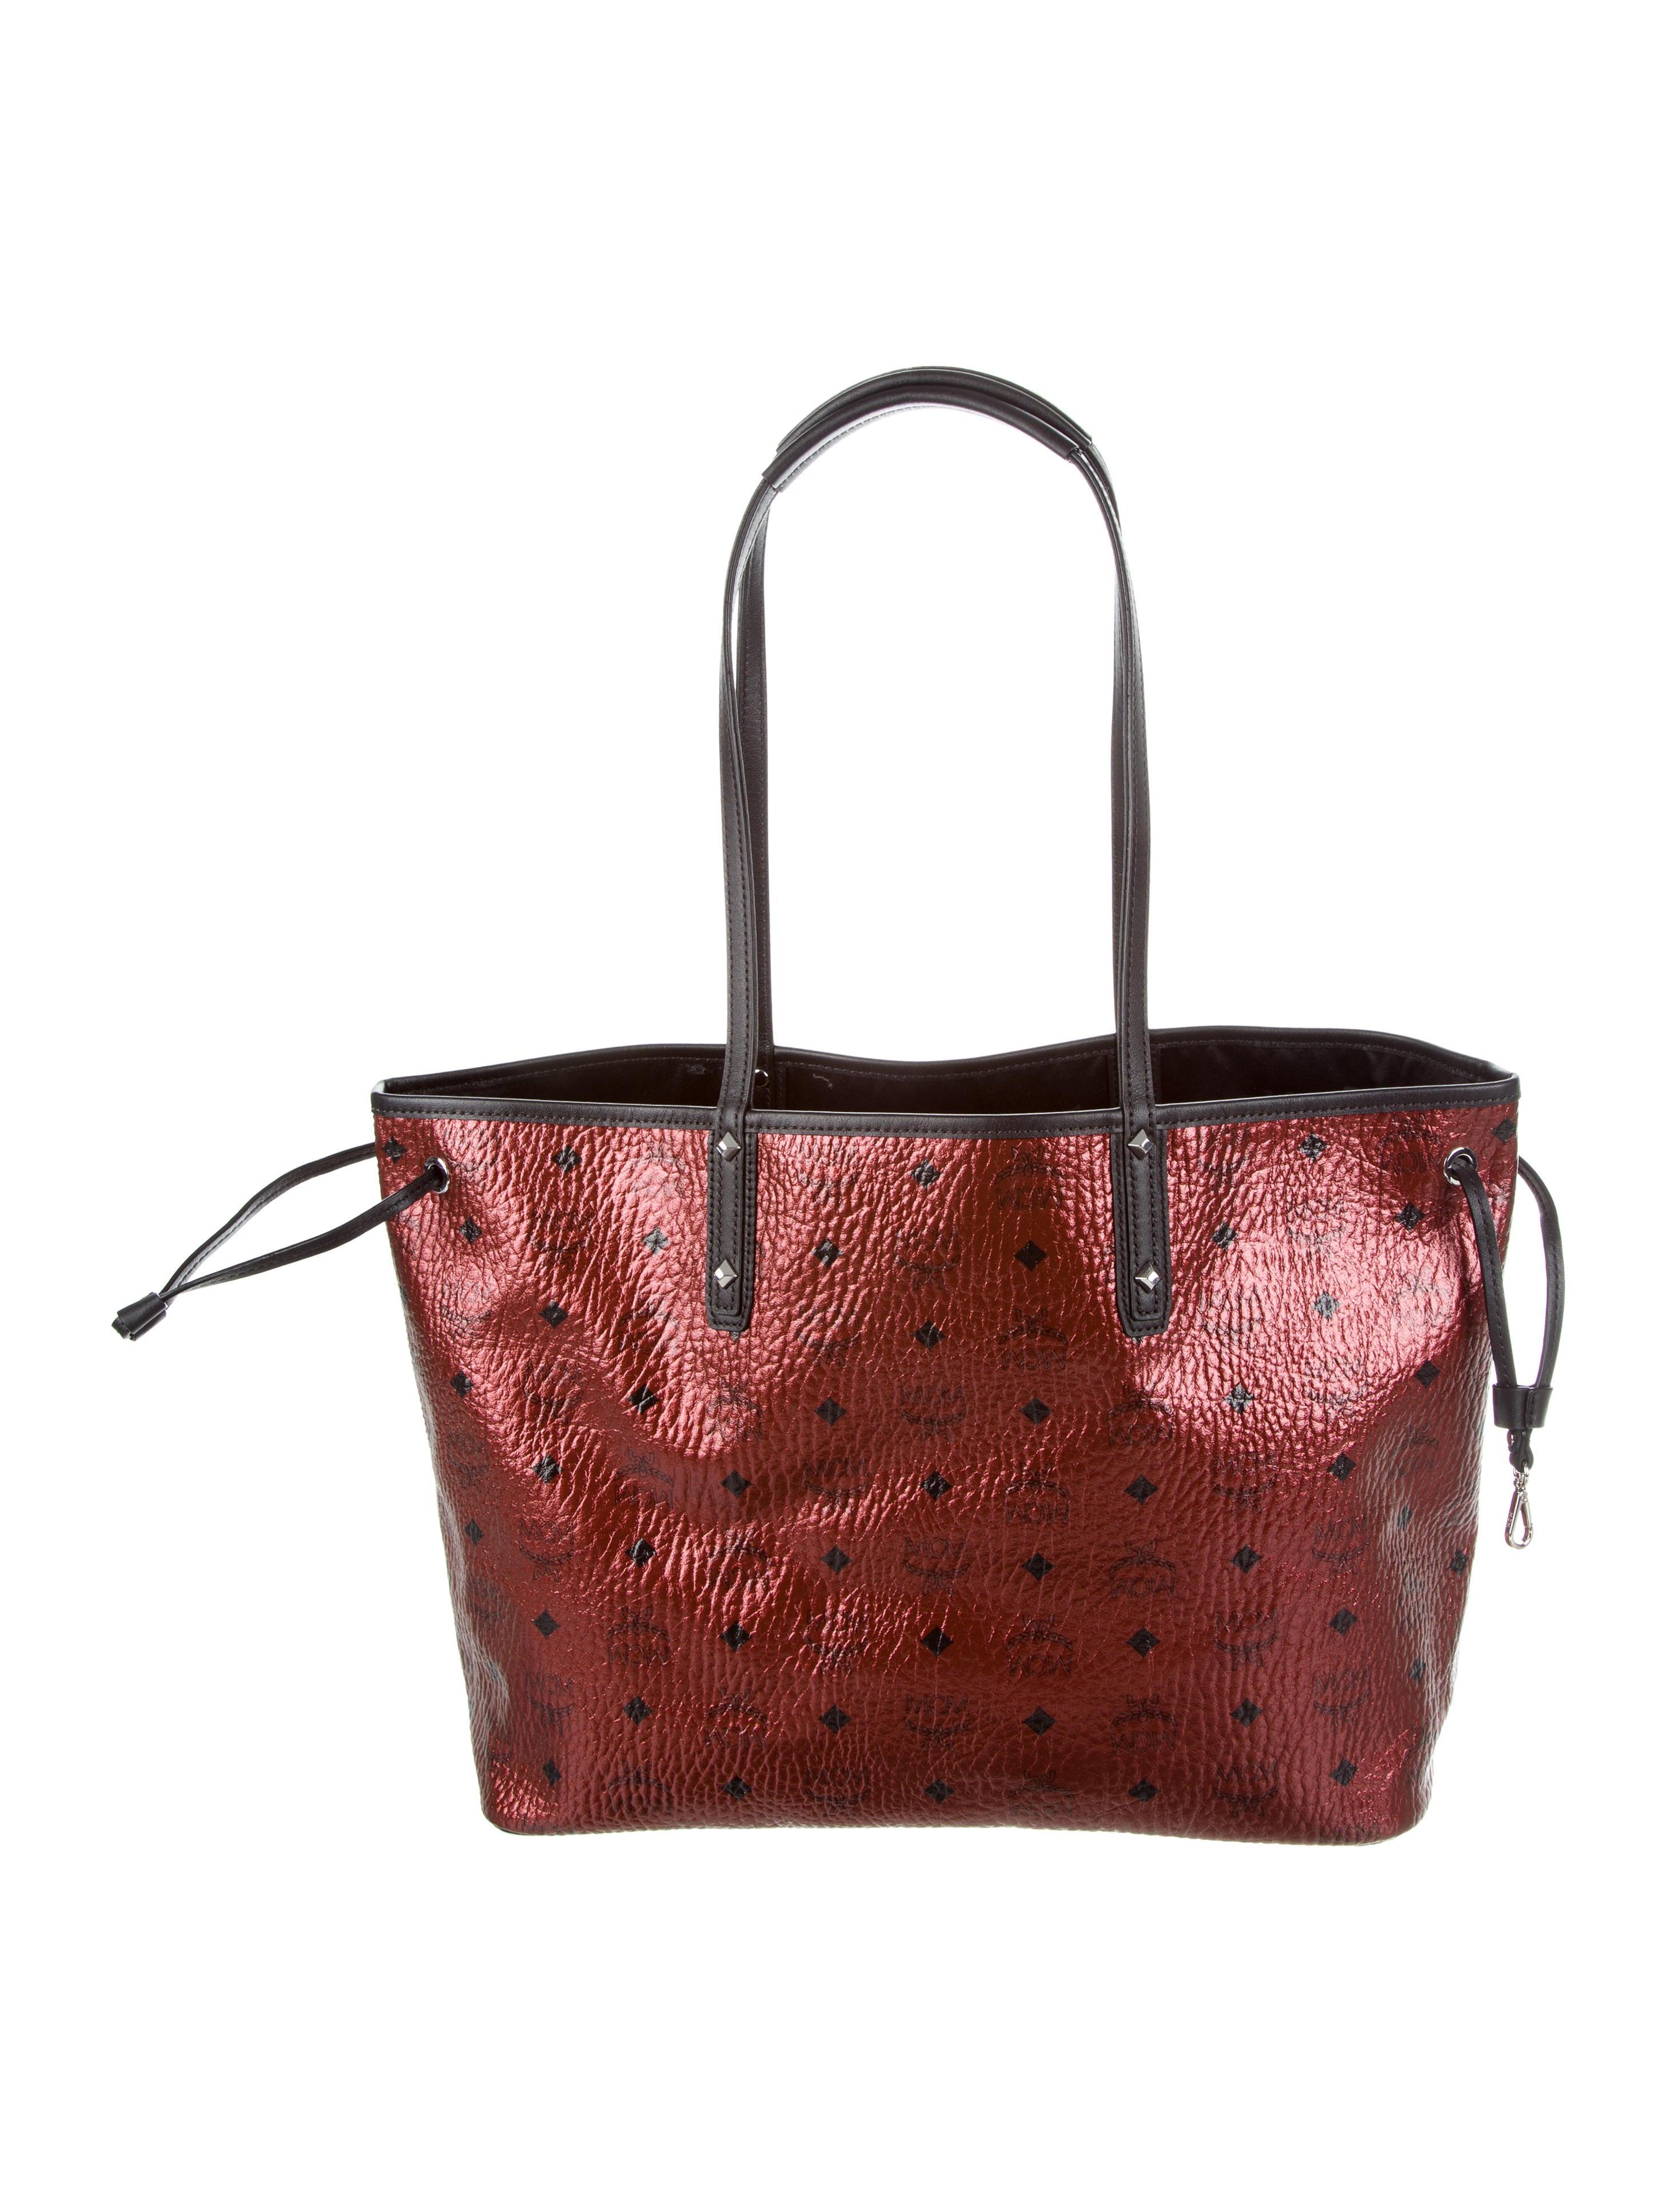 mcm medium reversible liz shopper w tags handbags. Black Bedroom Furniture Sets. Home Design Ideas